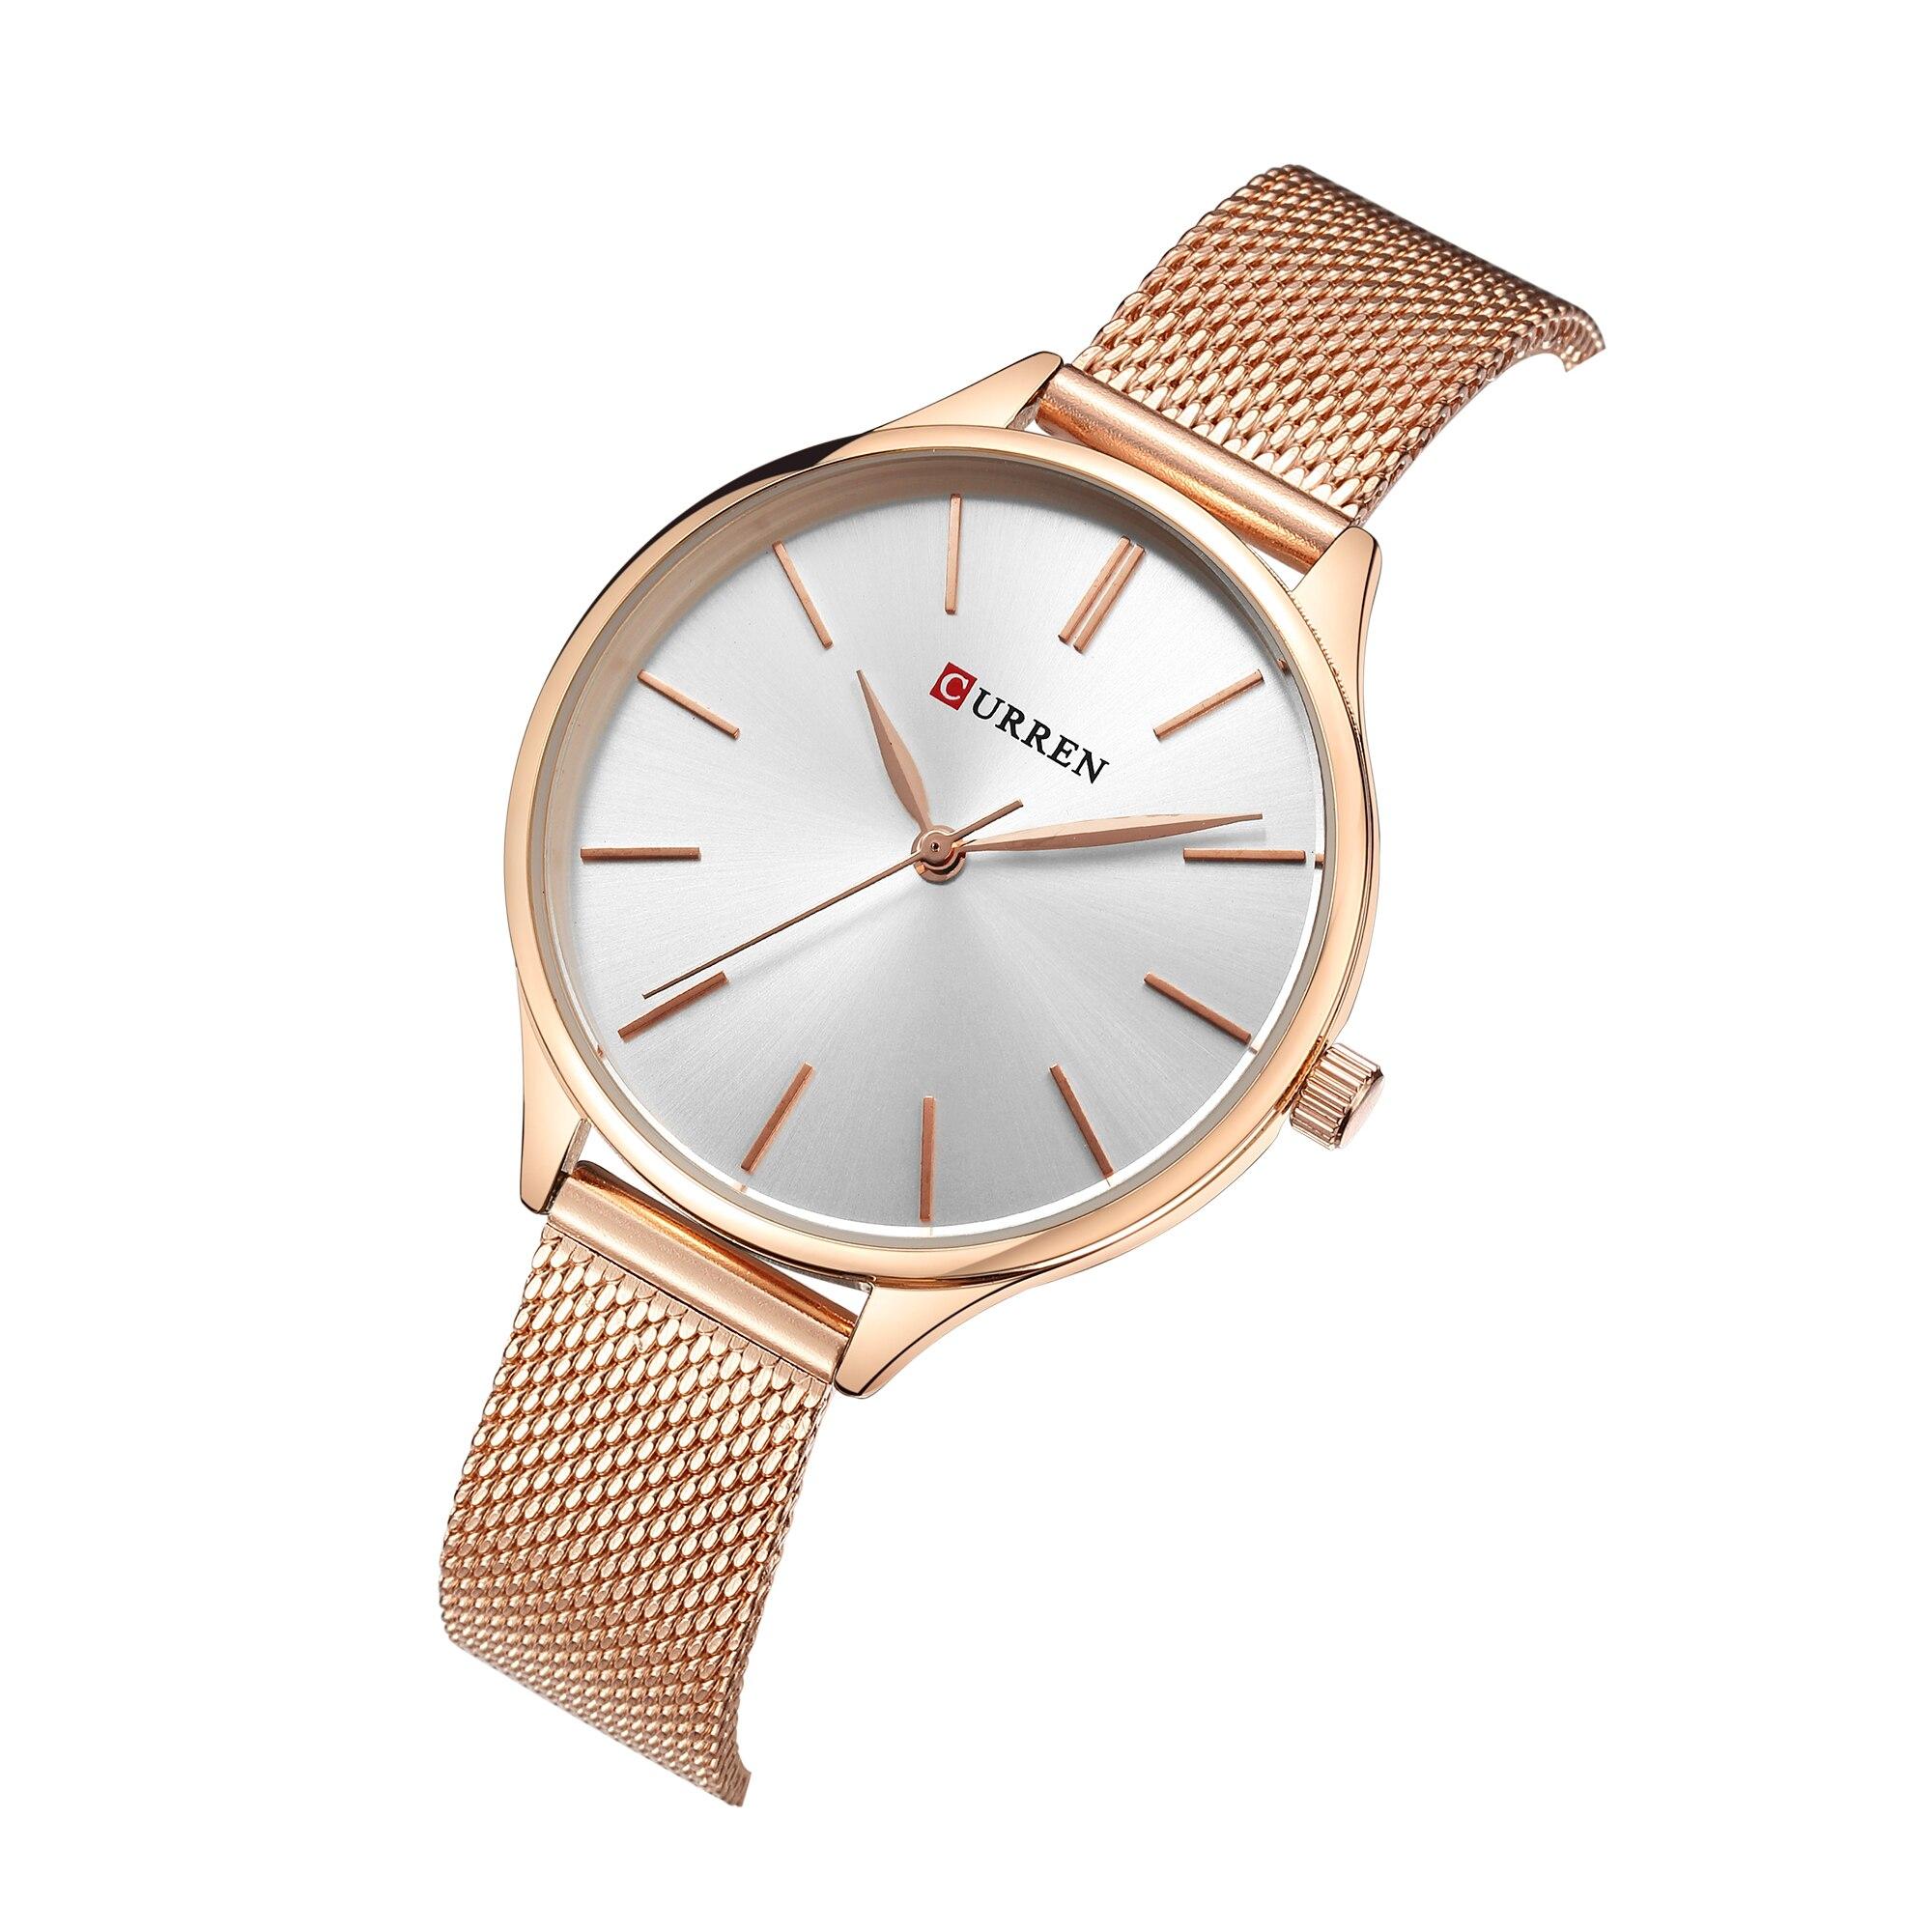 CURREN Ladies Watch Fashion Forward Creative Design Women Watch Rose Gold Stainless Steel Wrist Watch Latest Reloj Mujer Outdoor in Women 39 s Watches from Watches